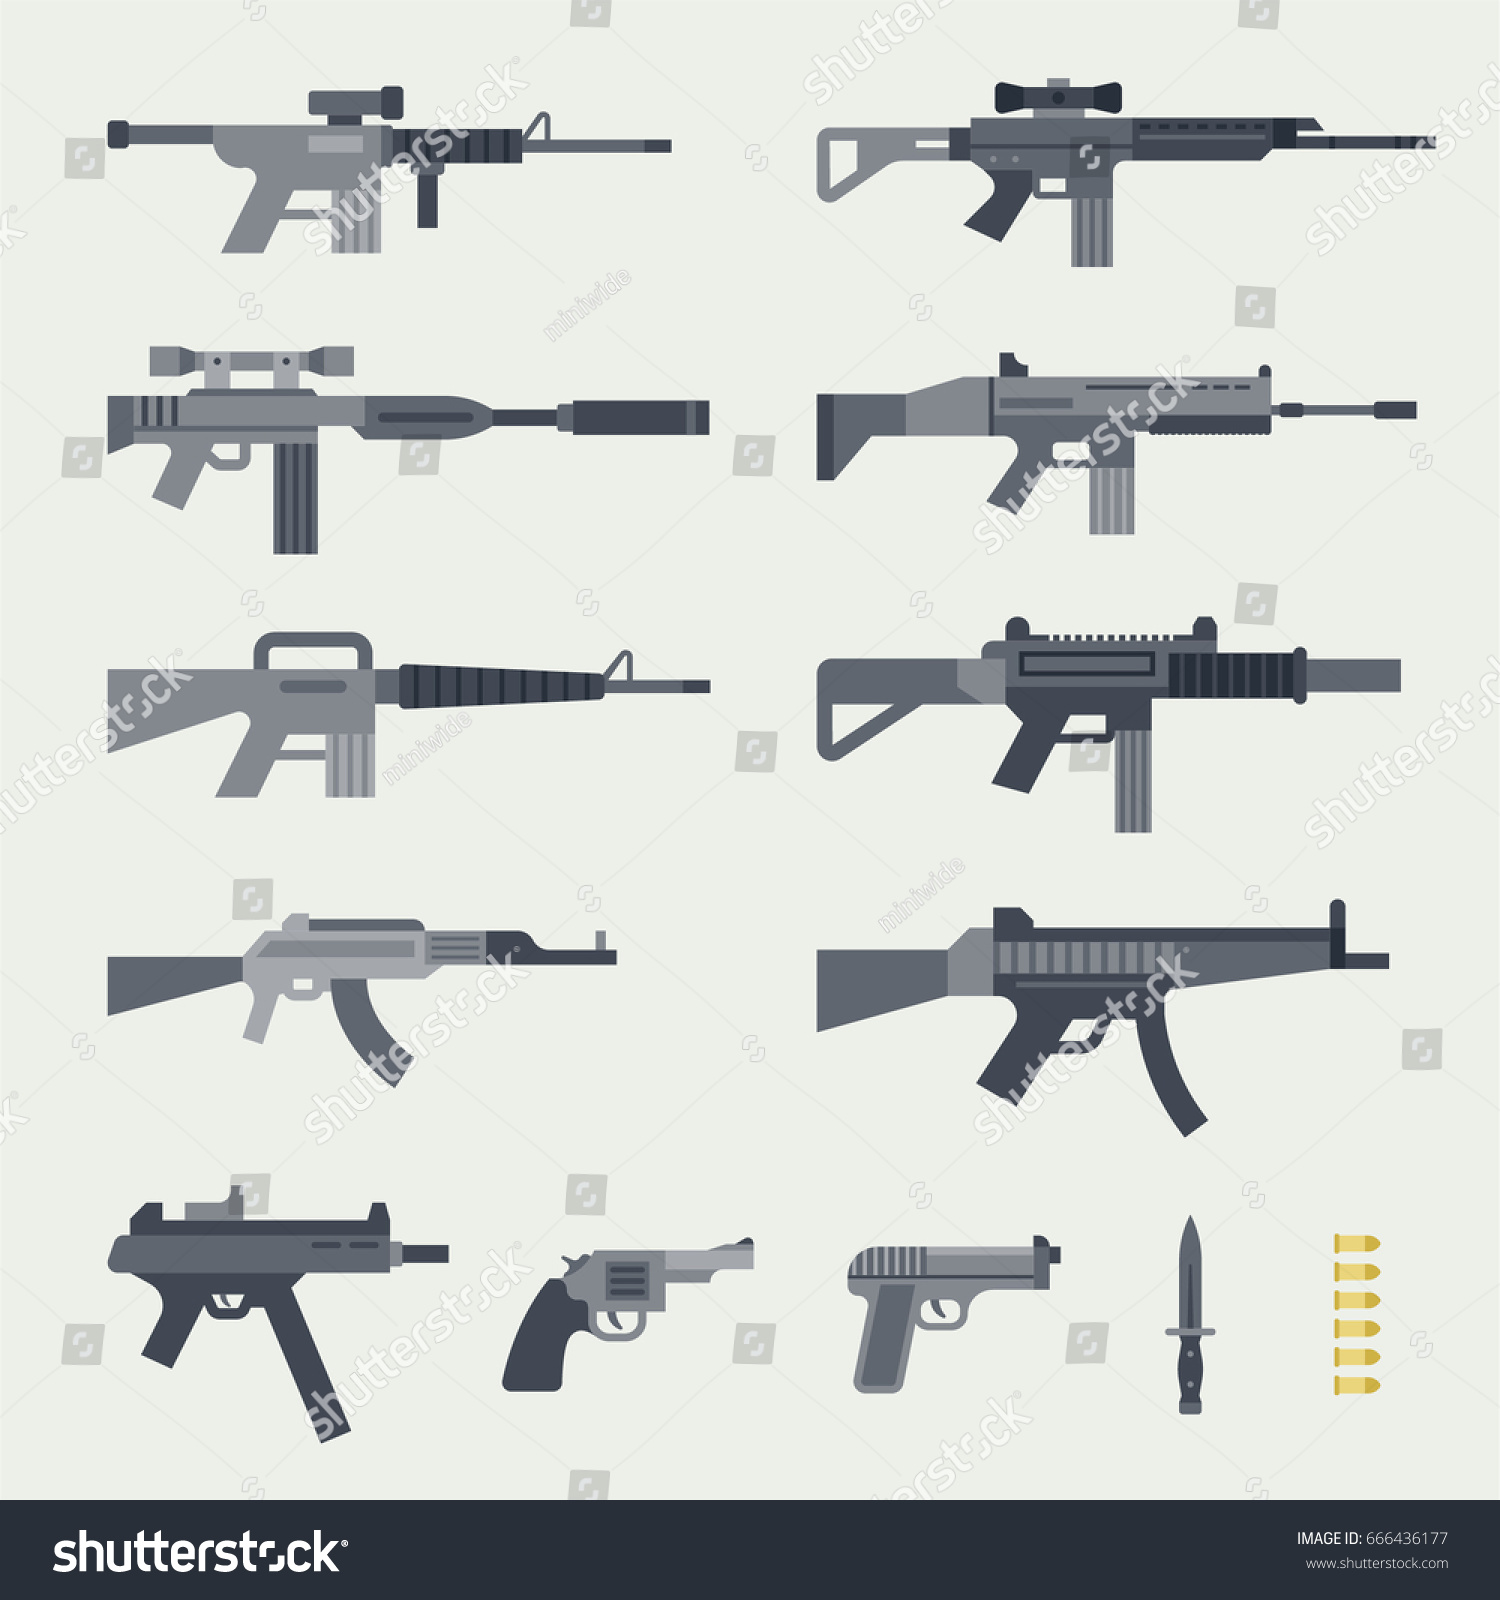 different types guns vector illustration flat のベクター画像素材